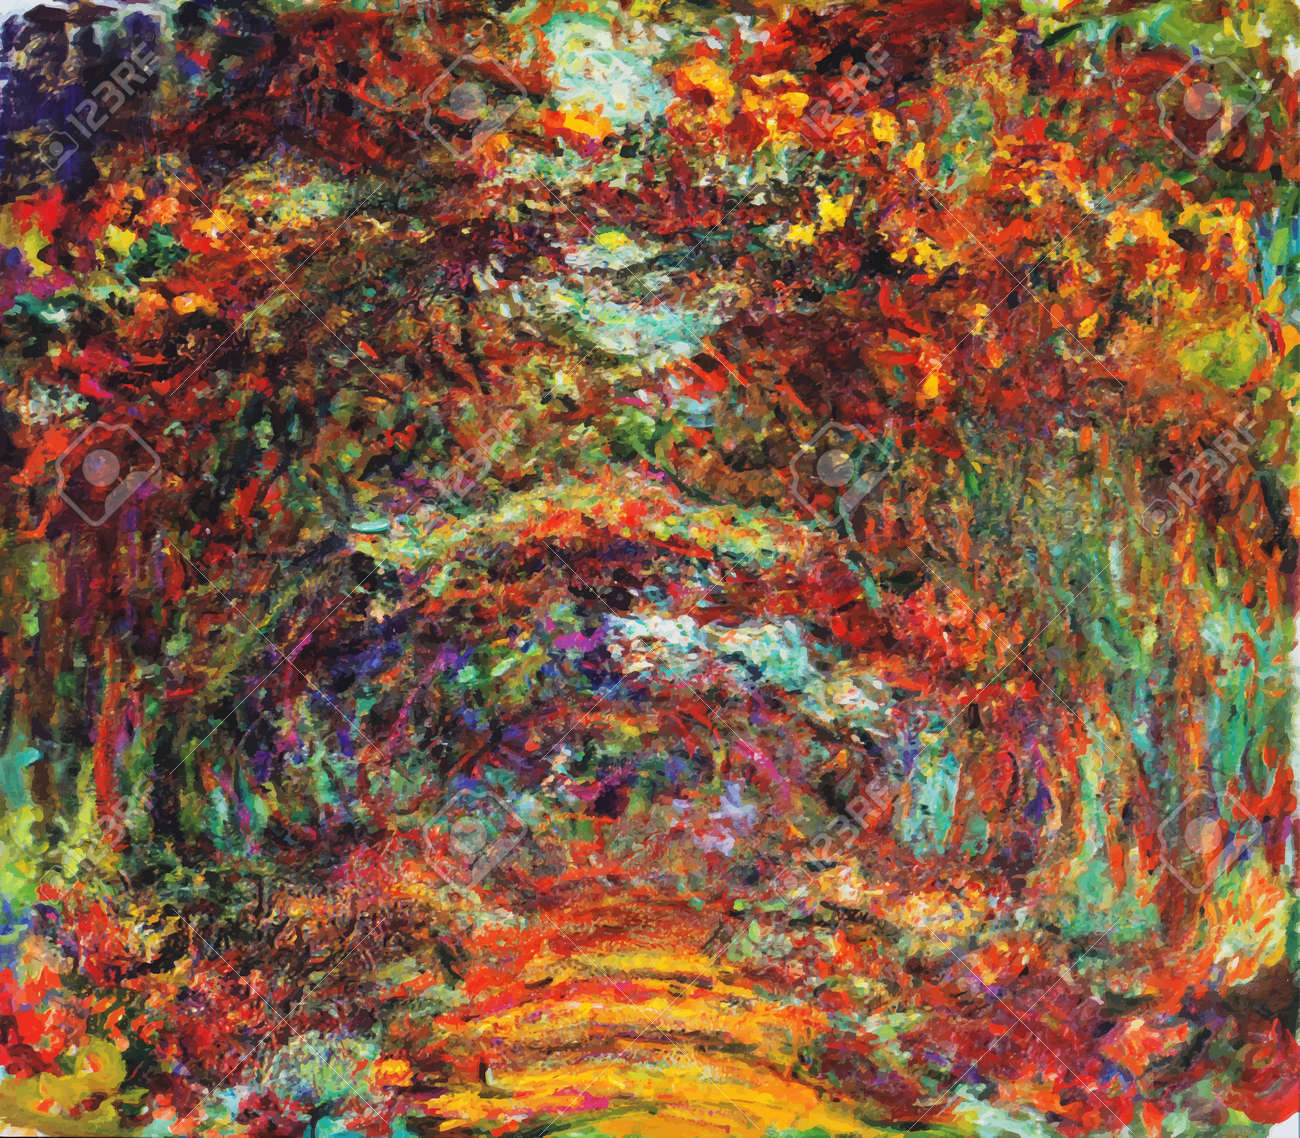 My digital altered The Rose Walk by Claude Monet 1922, Museum Marmottan Monet, Paris - 151901753